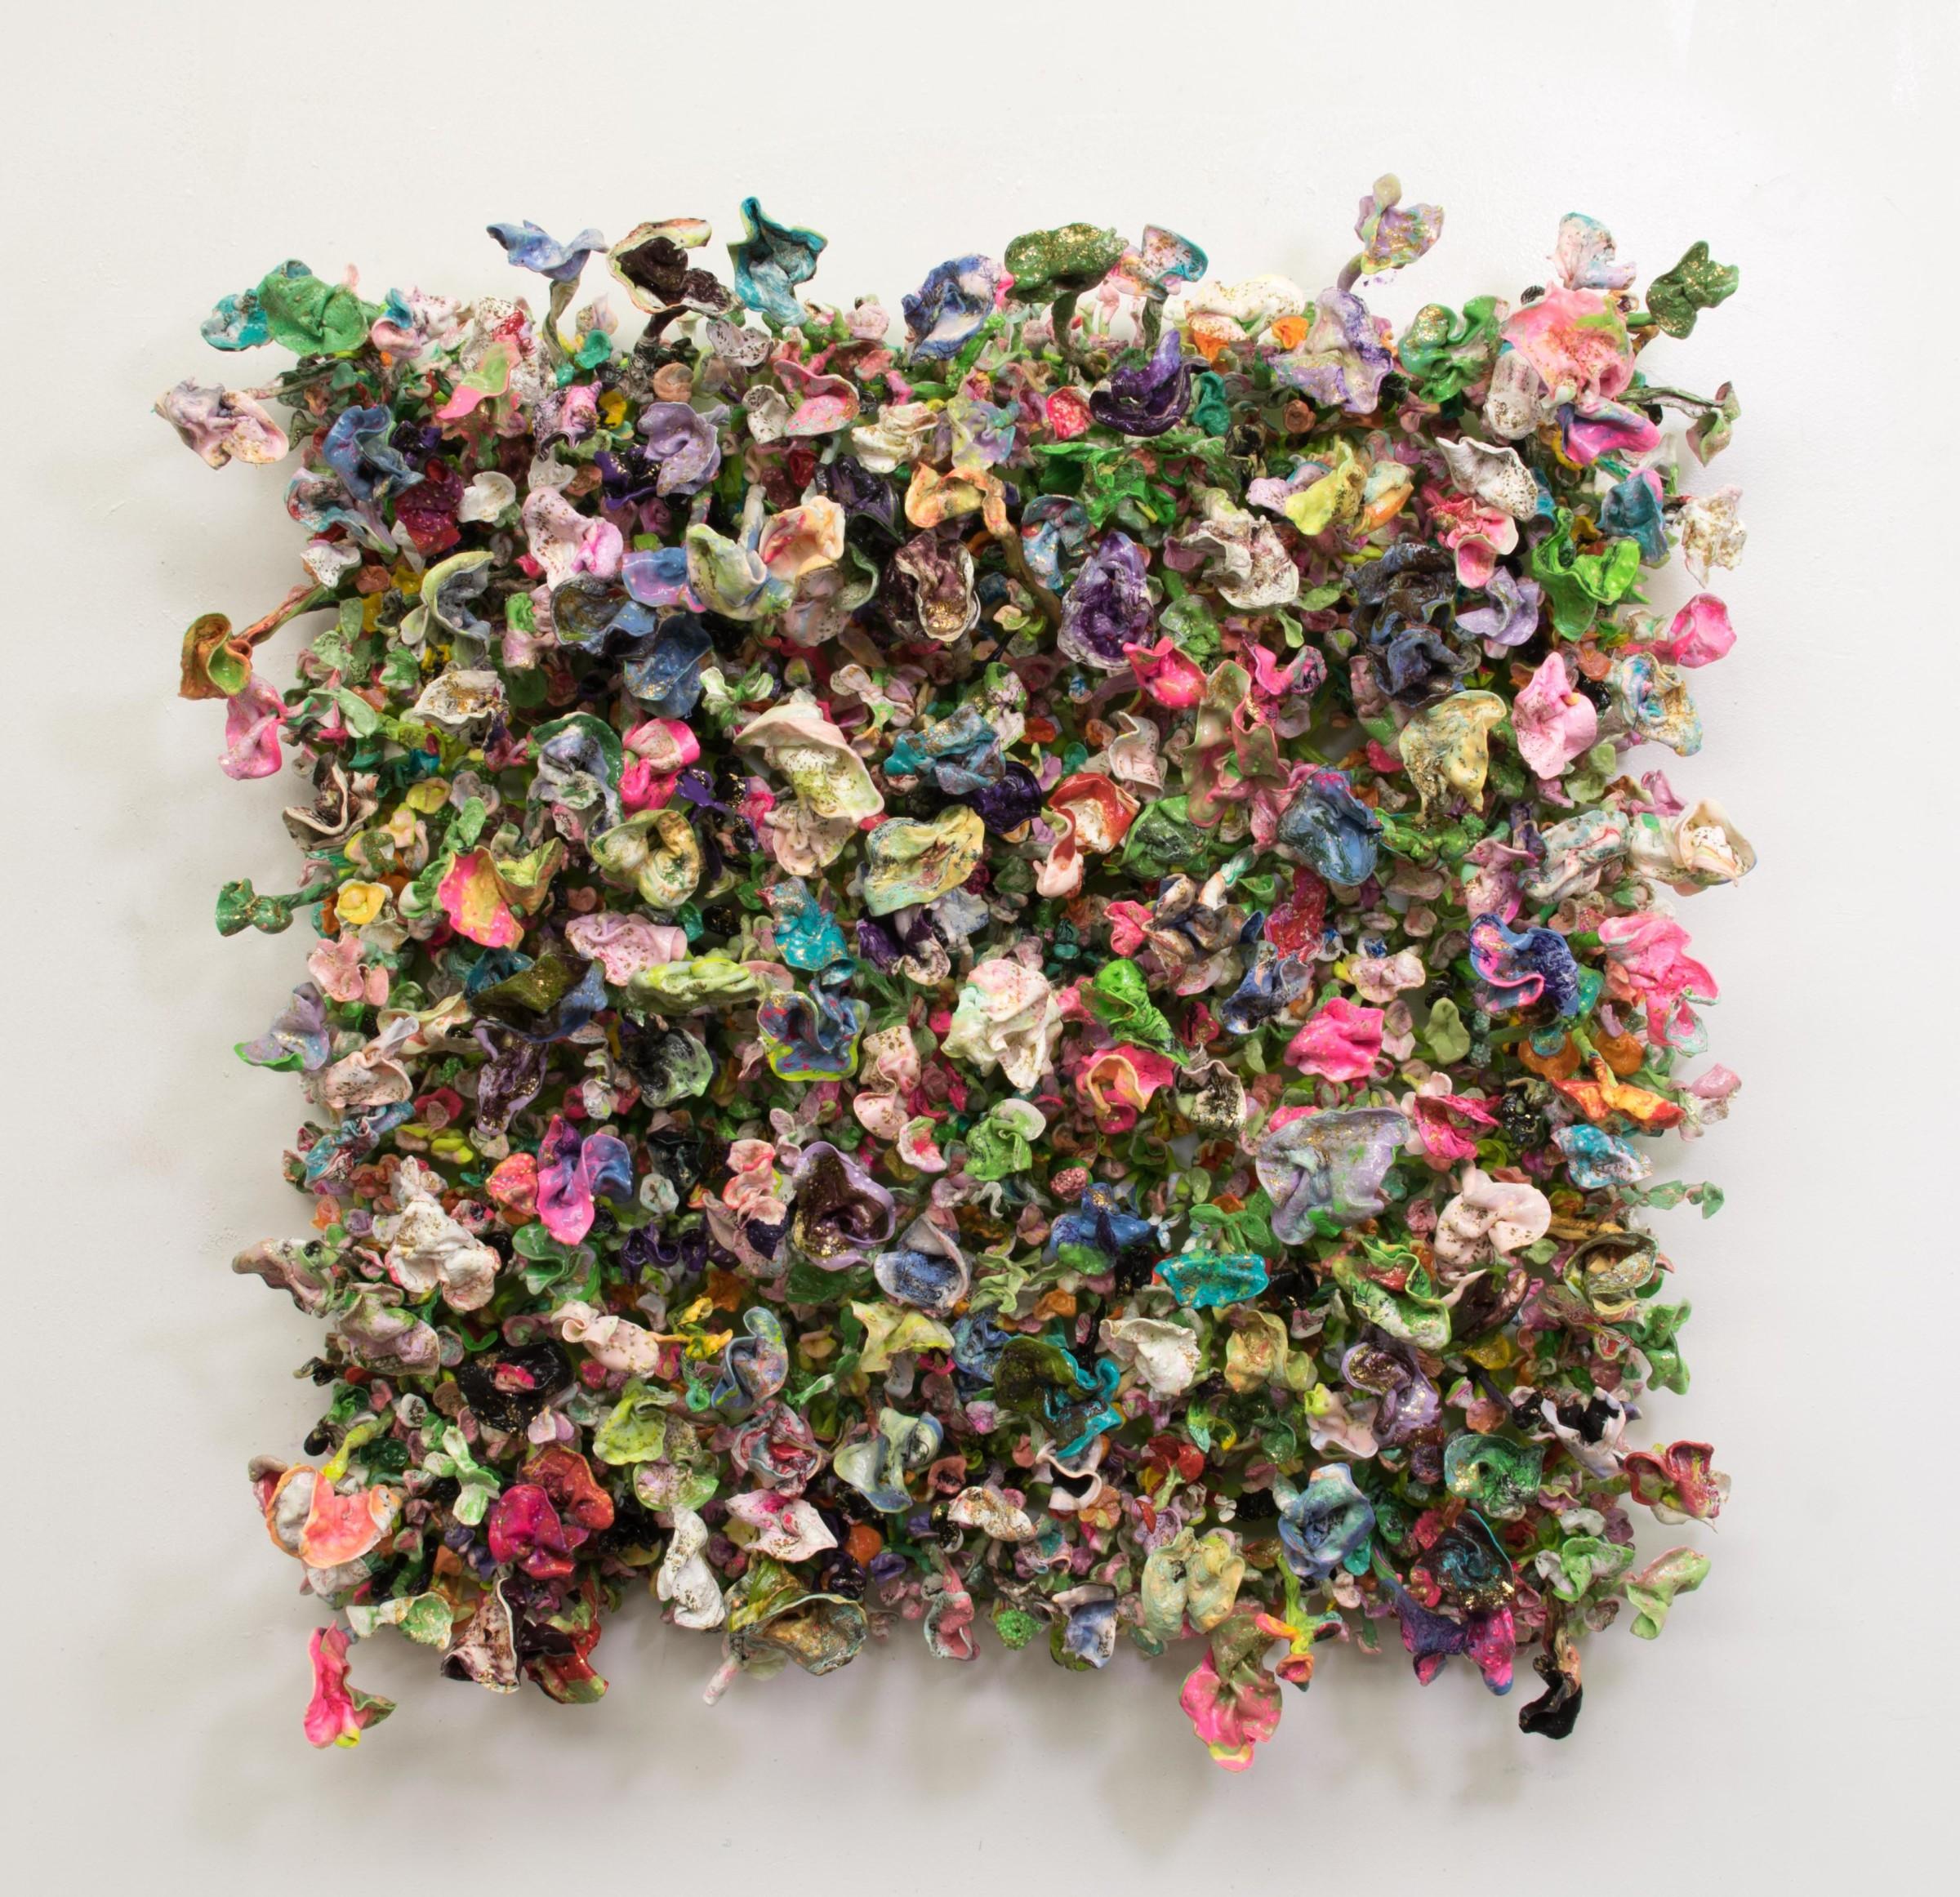 "<span class=""link fancybox-details-link""><a href=""/artists/42-stefan-gross/works/5005-stefan-gross-flower-bonanza-fin-de-siecle-2018/"">View Detail Page</a></span><div class=""artist""><strong>Stefan Gross</strong></div> <div class=""title""><em>Flower Bonanza - fin de siecle</em>, 2018</div> <div class=""medium"">Oil Plastic</div> <div class=""dimensions"">140 x 140 cm</div><div class=""price"">€12,000.00</div>"